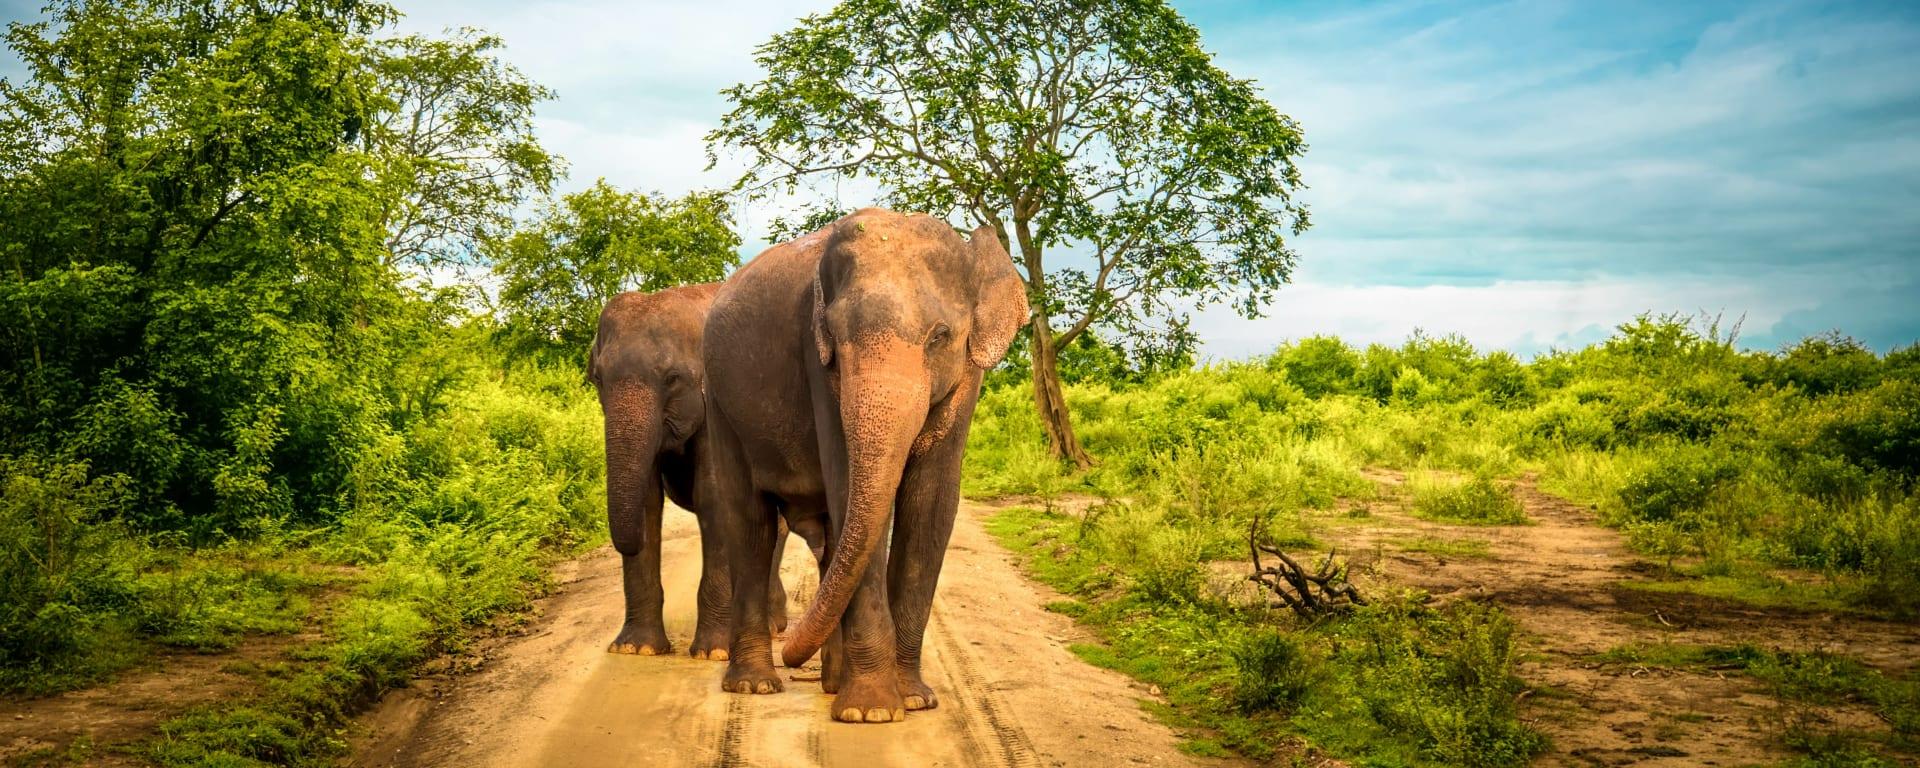 Sri Lanka entdecken mit Tischler Reisen: Sri Lanka Yala National Park Elefanten